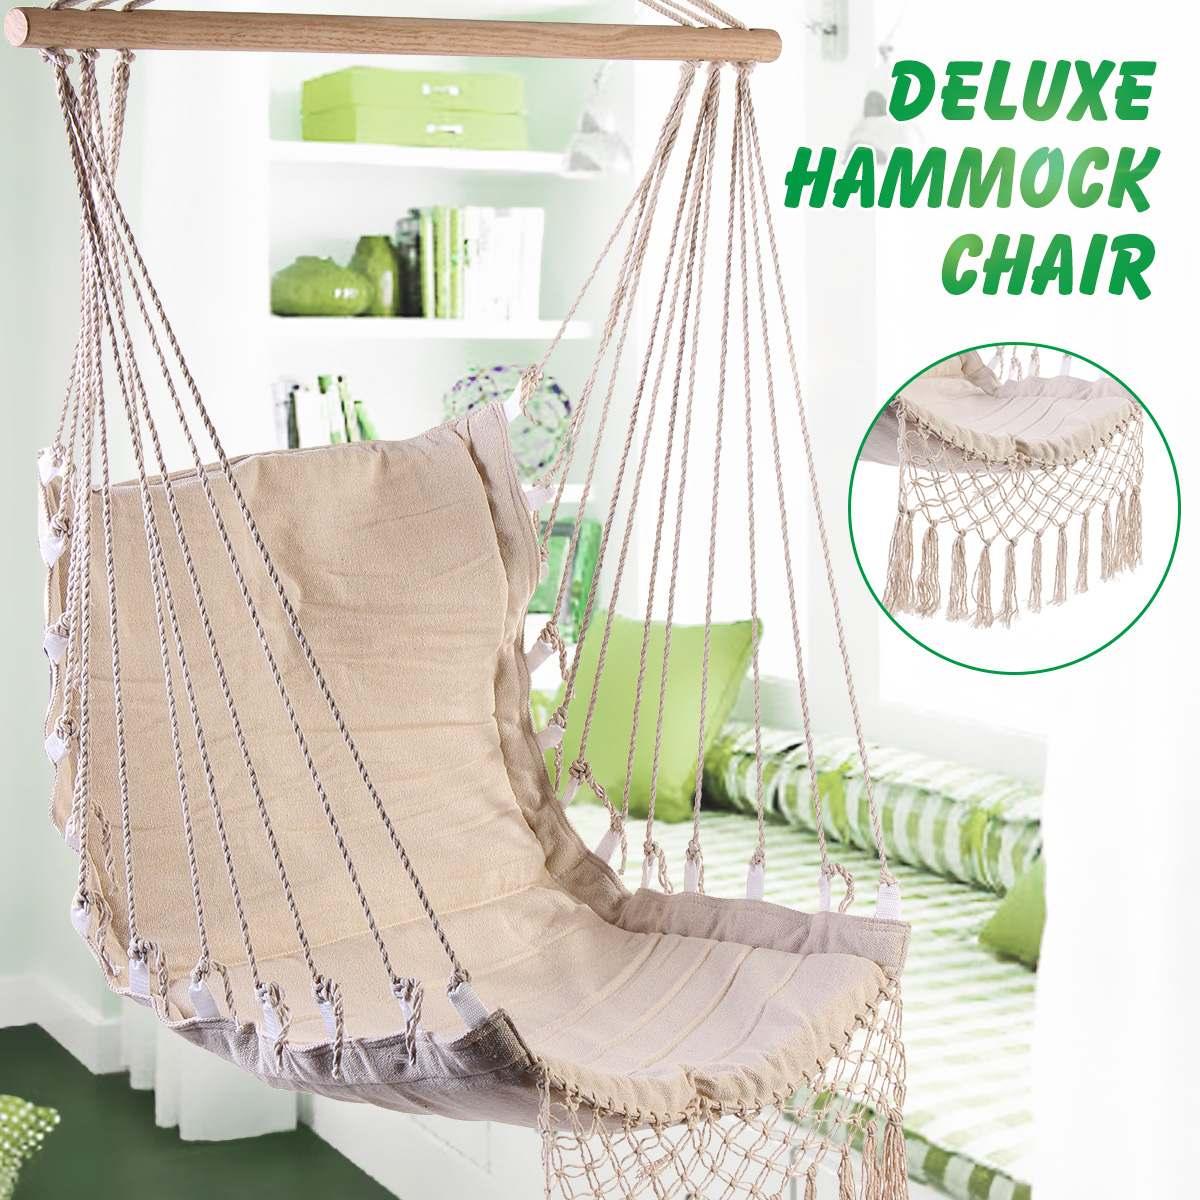 Nordic Style Home Garden Hanging Hammock Chair Outdoor Indoor Dormitory Swing Hanging Chair With Wooden Rod